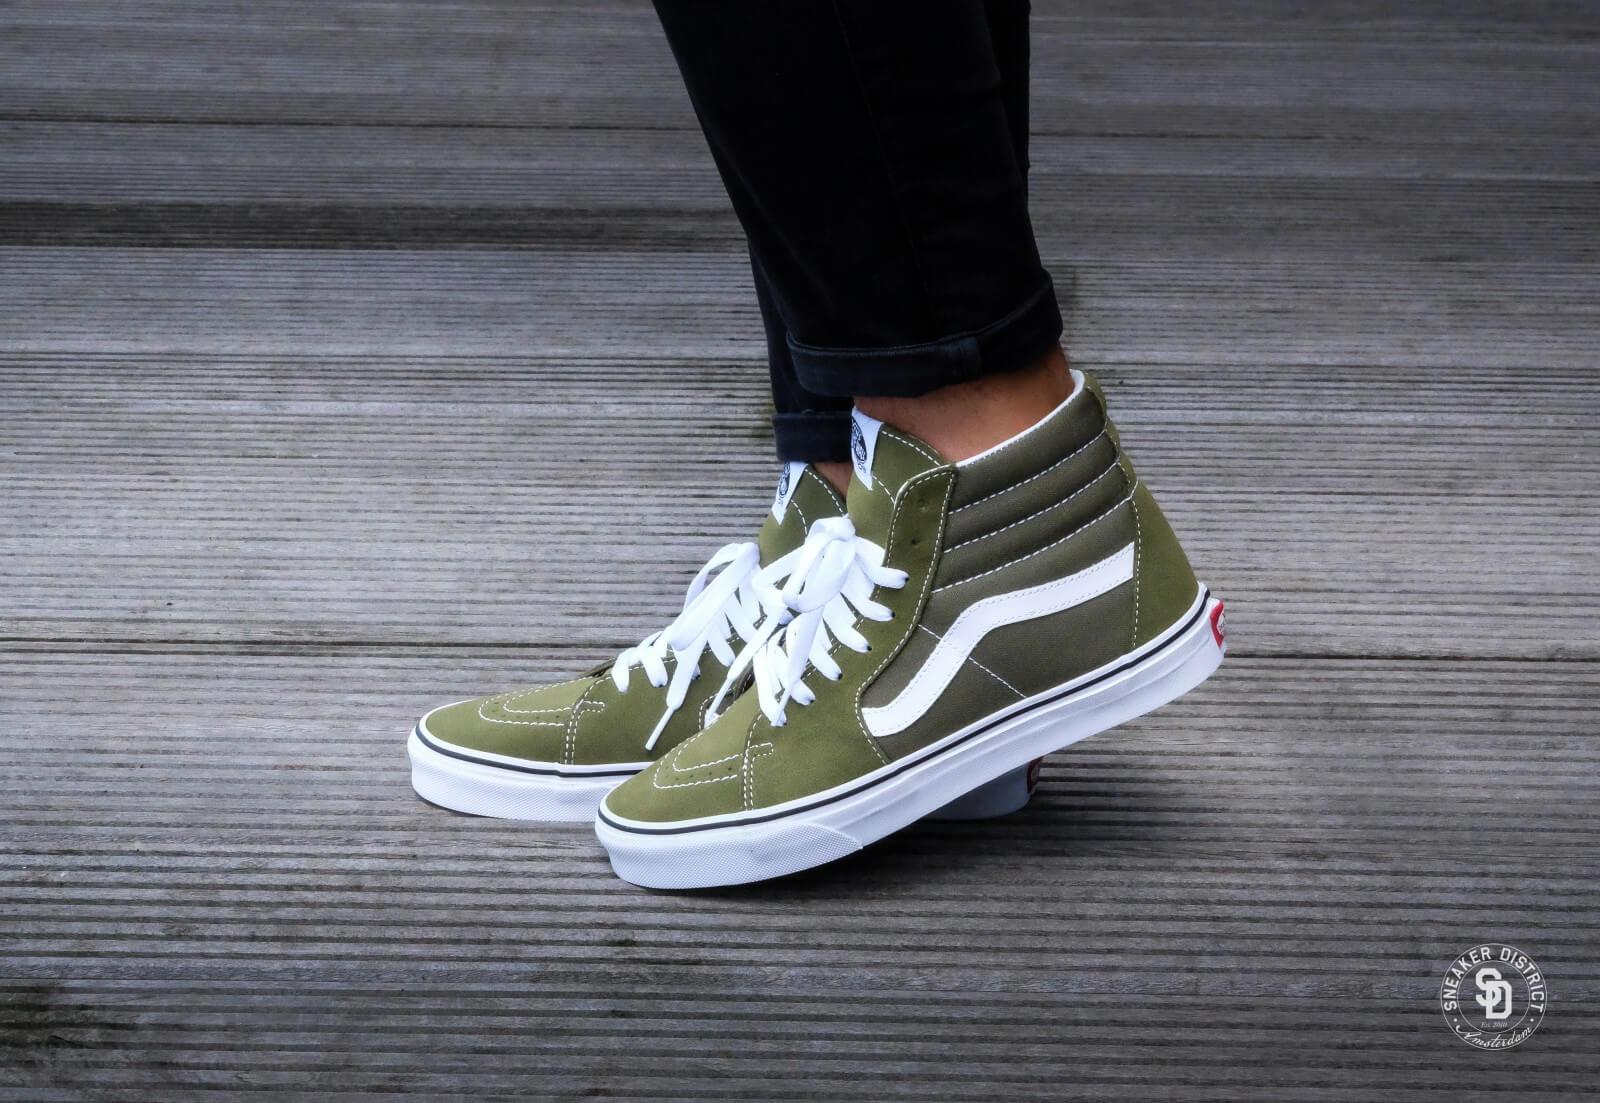 Artsy Vans Shoes